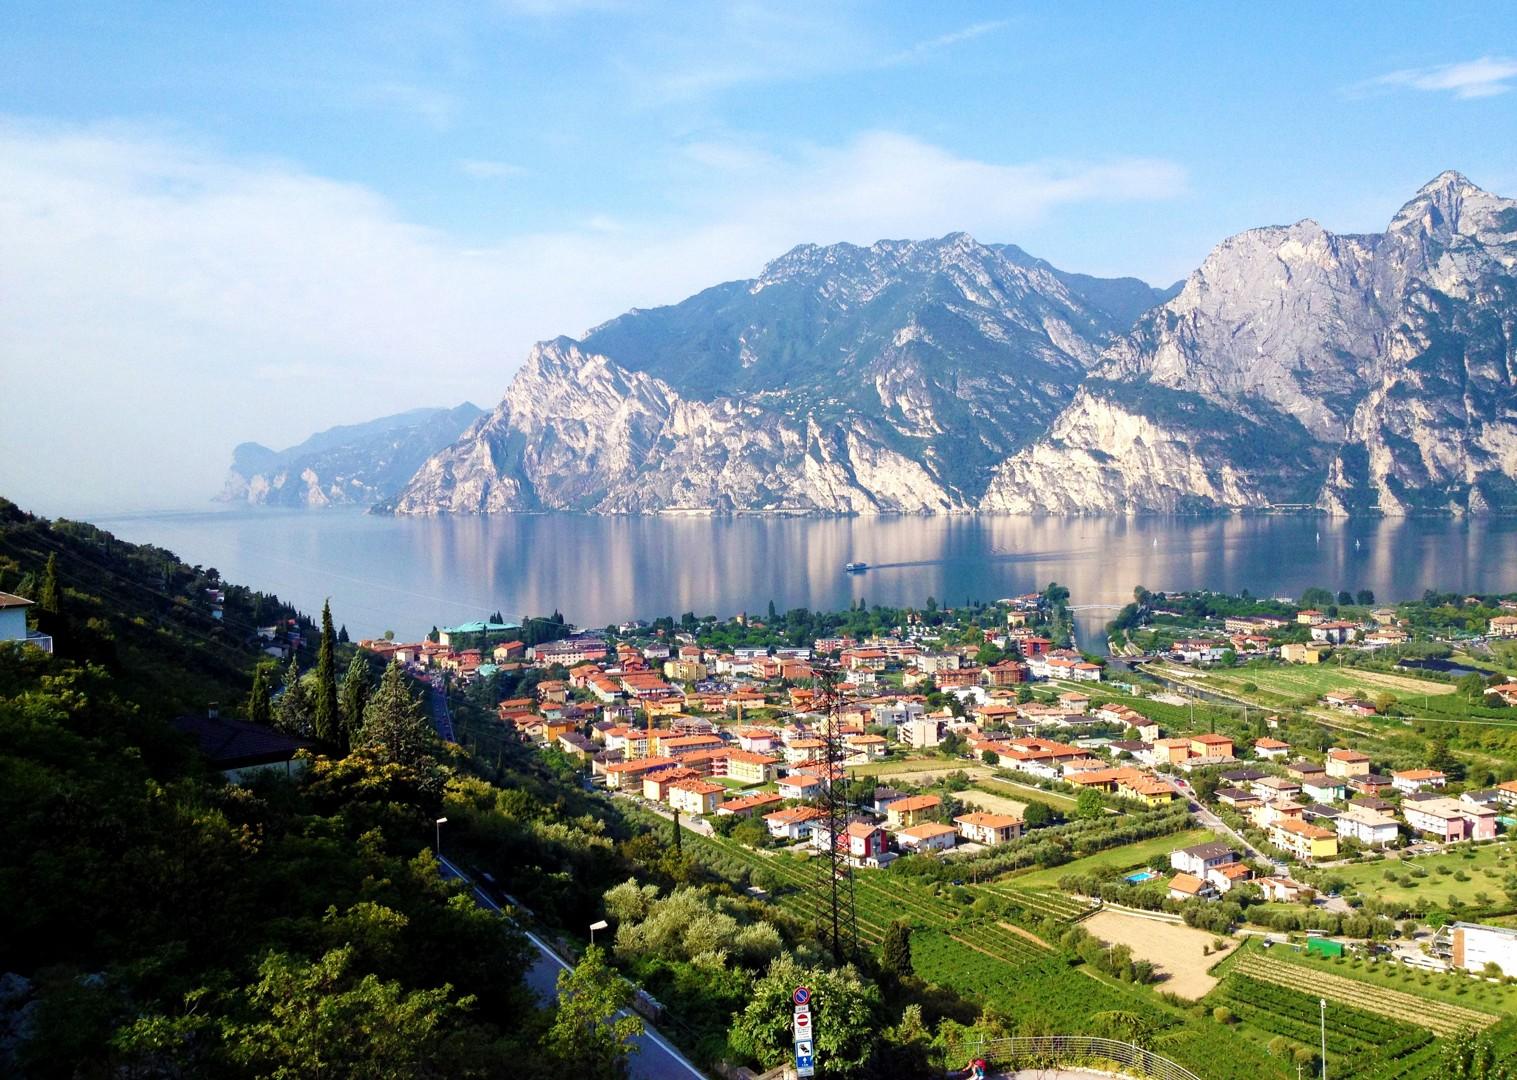 italian-austrian-guided-leisure-cycling-holiday.jpg - Austria and Italy - La Via Claudia - Guided Leisure Cycling Holiday - Leisure Cycling